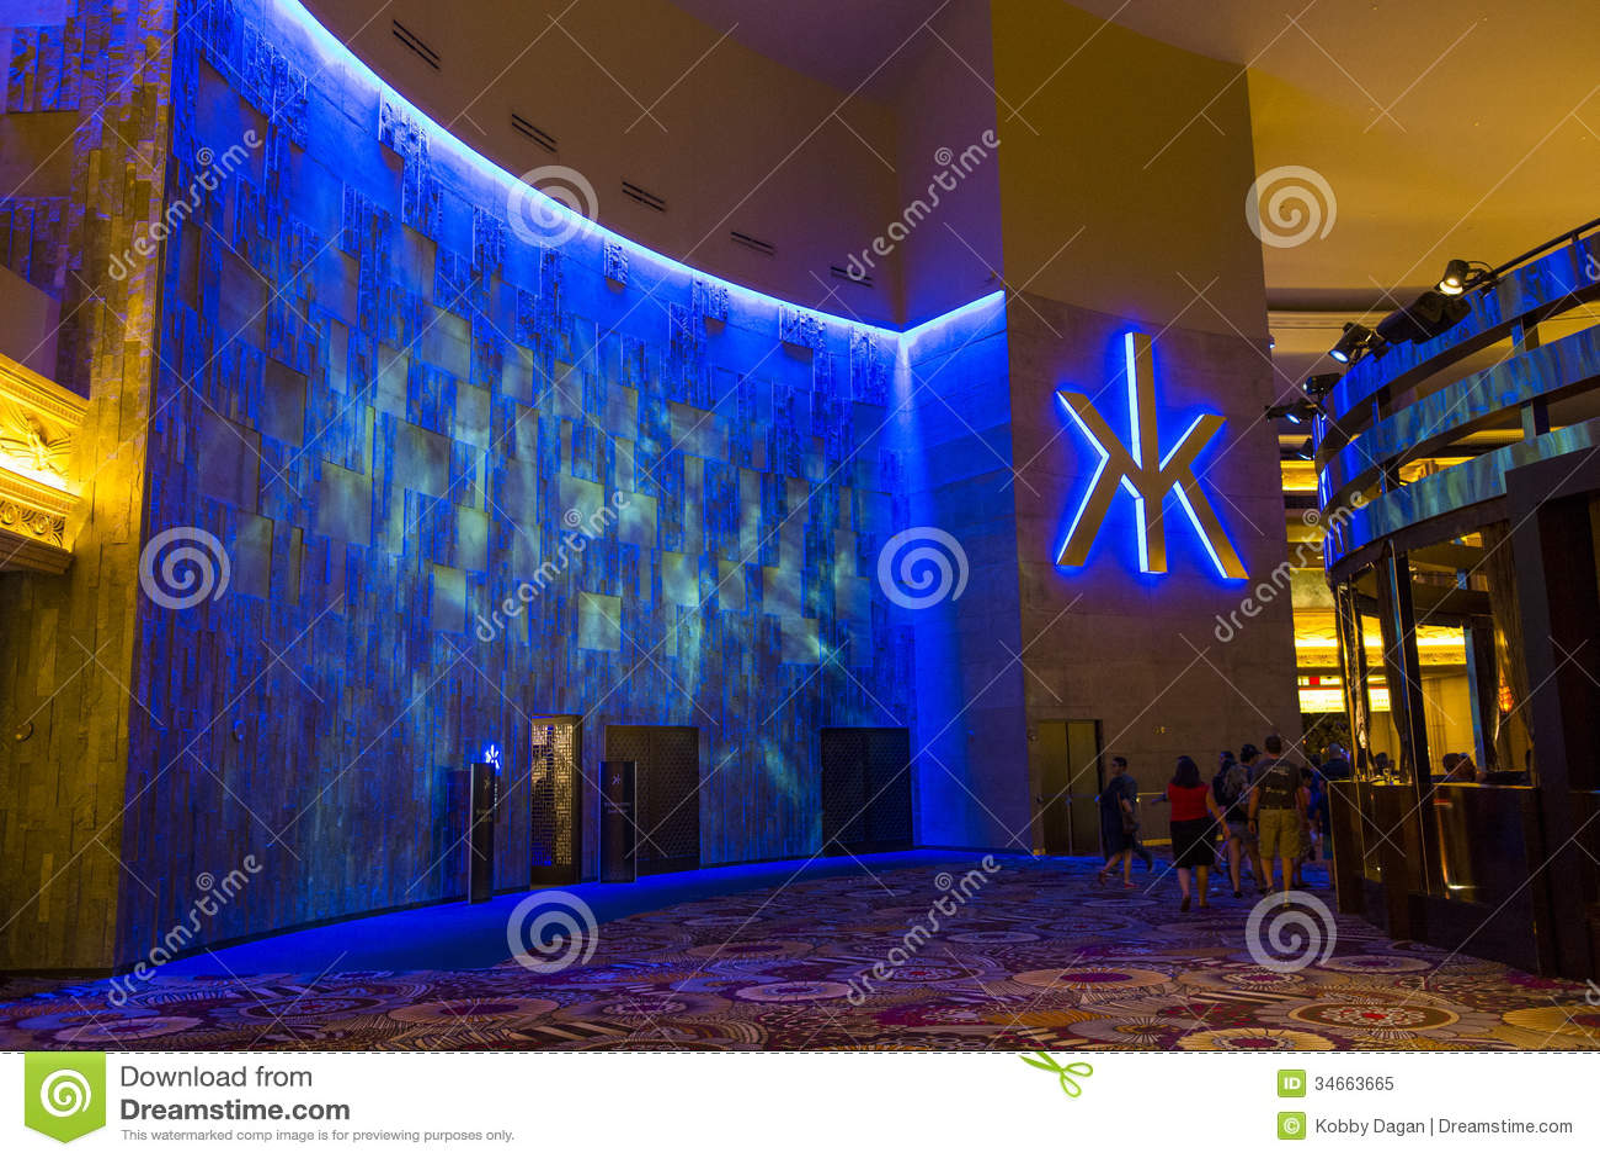 Casino in Zypern - 619775